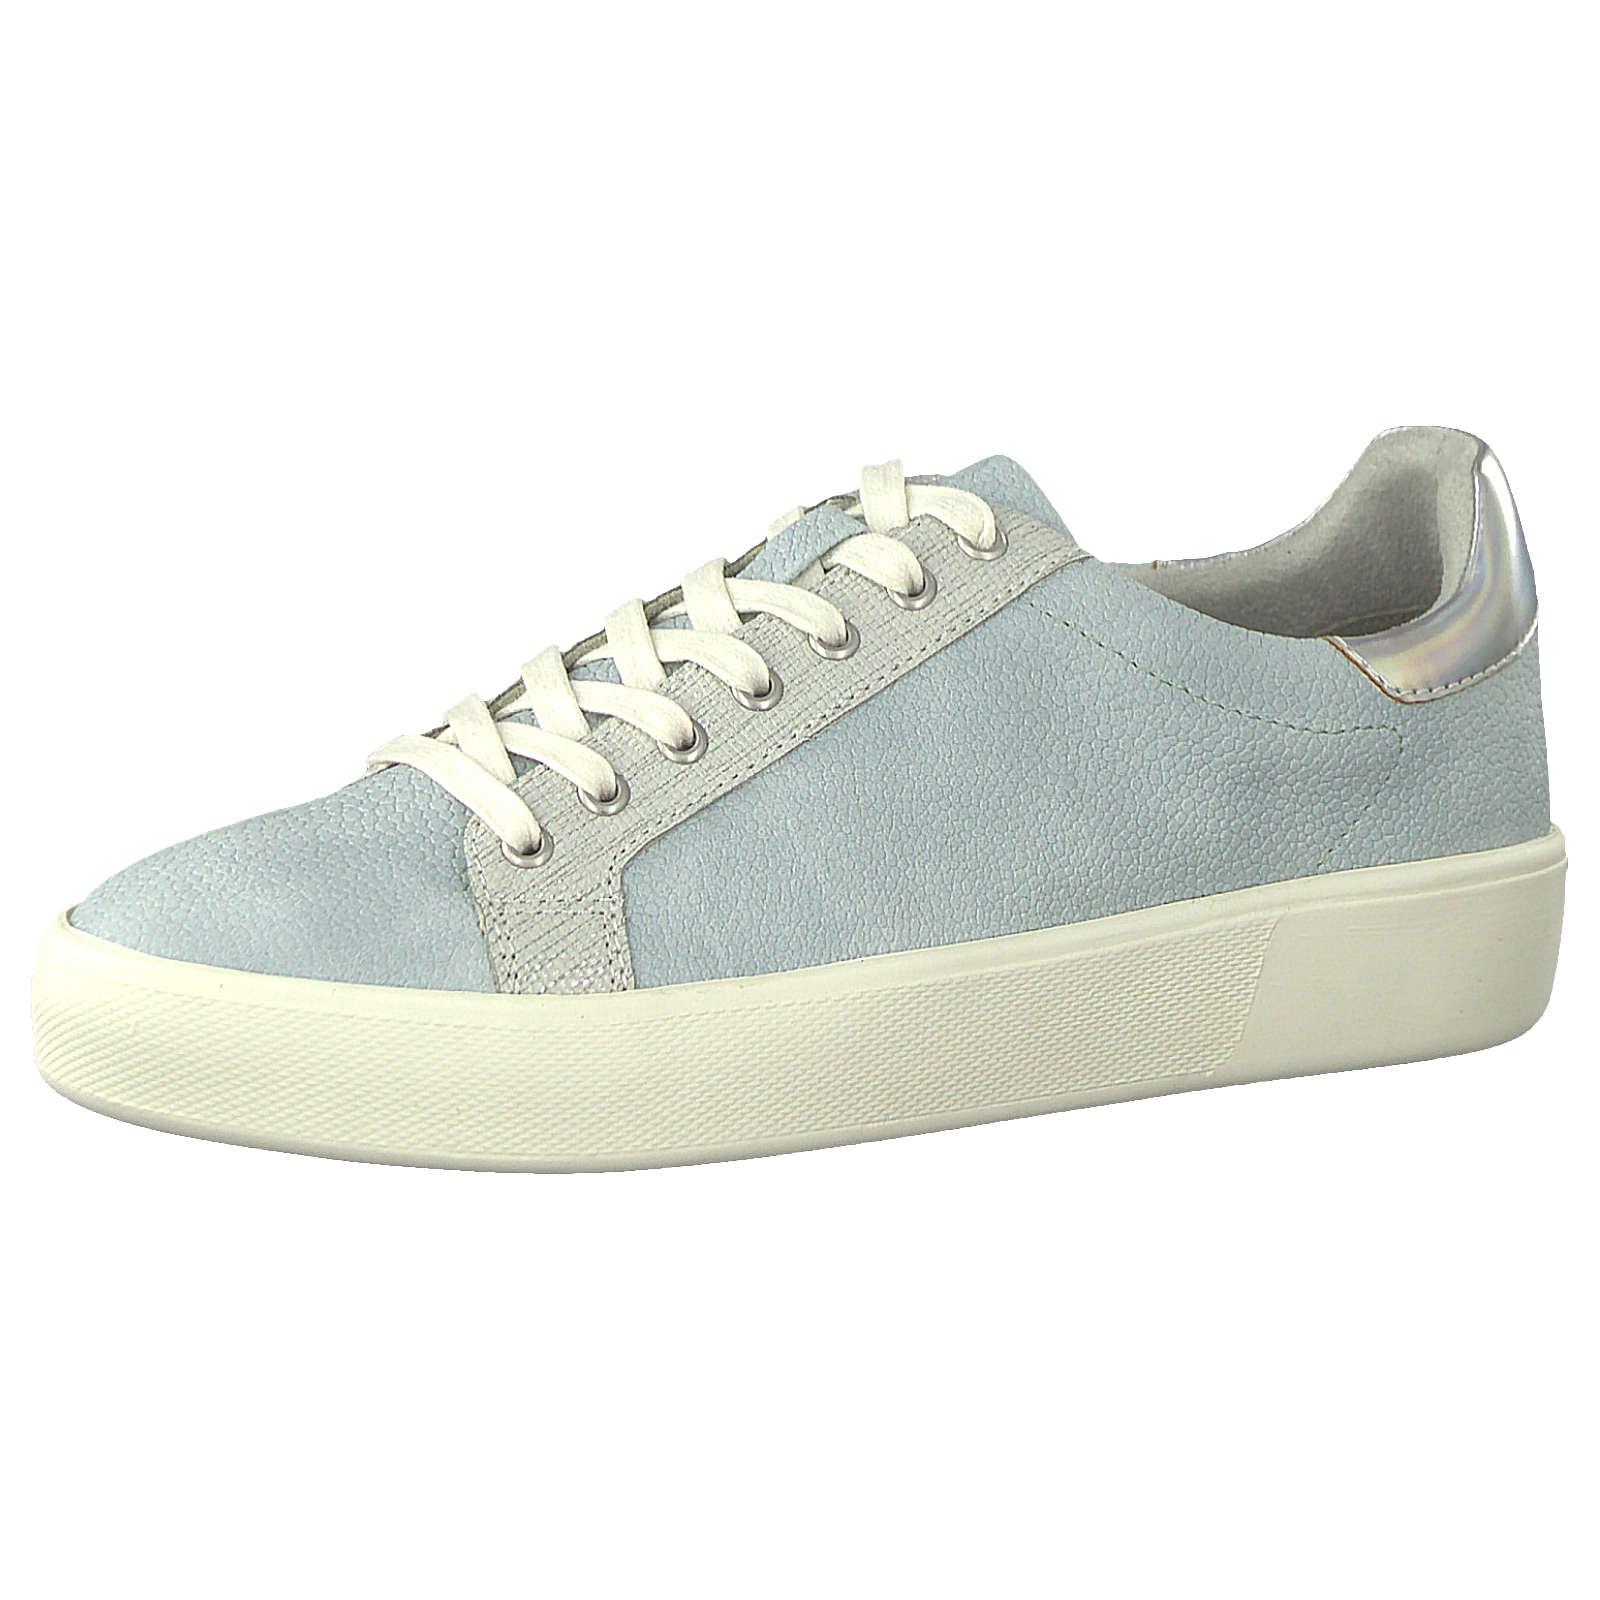 Tamaris Sneakers Low hellblau Damen Gr. 36